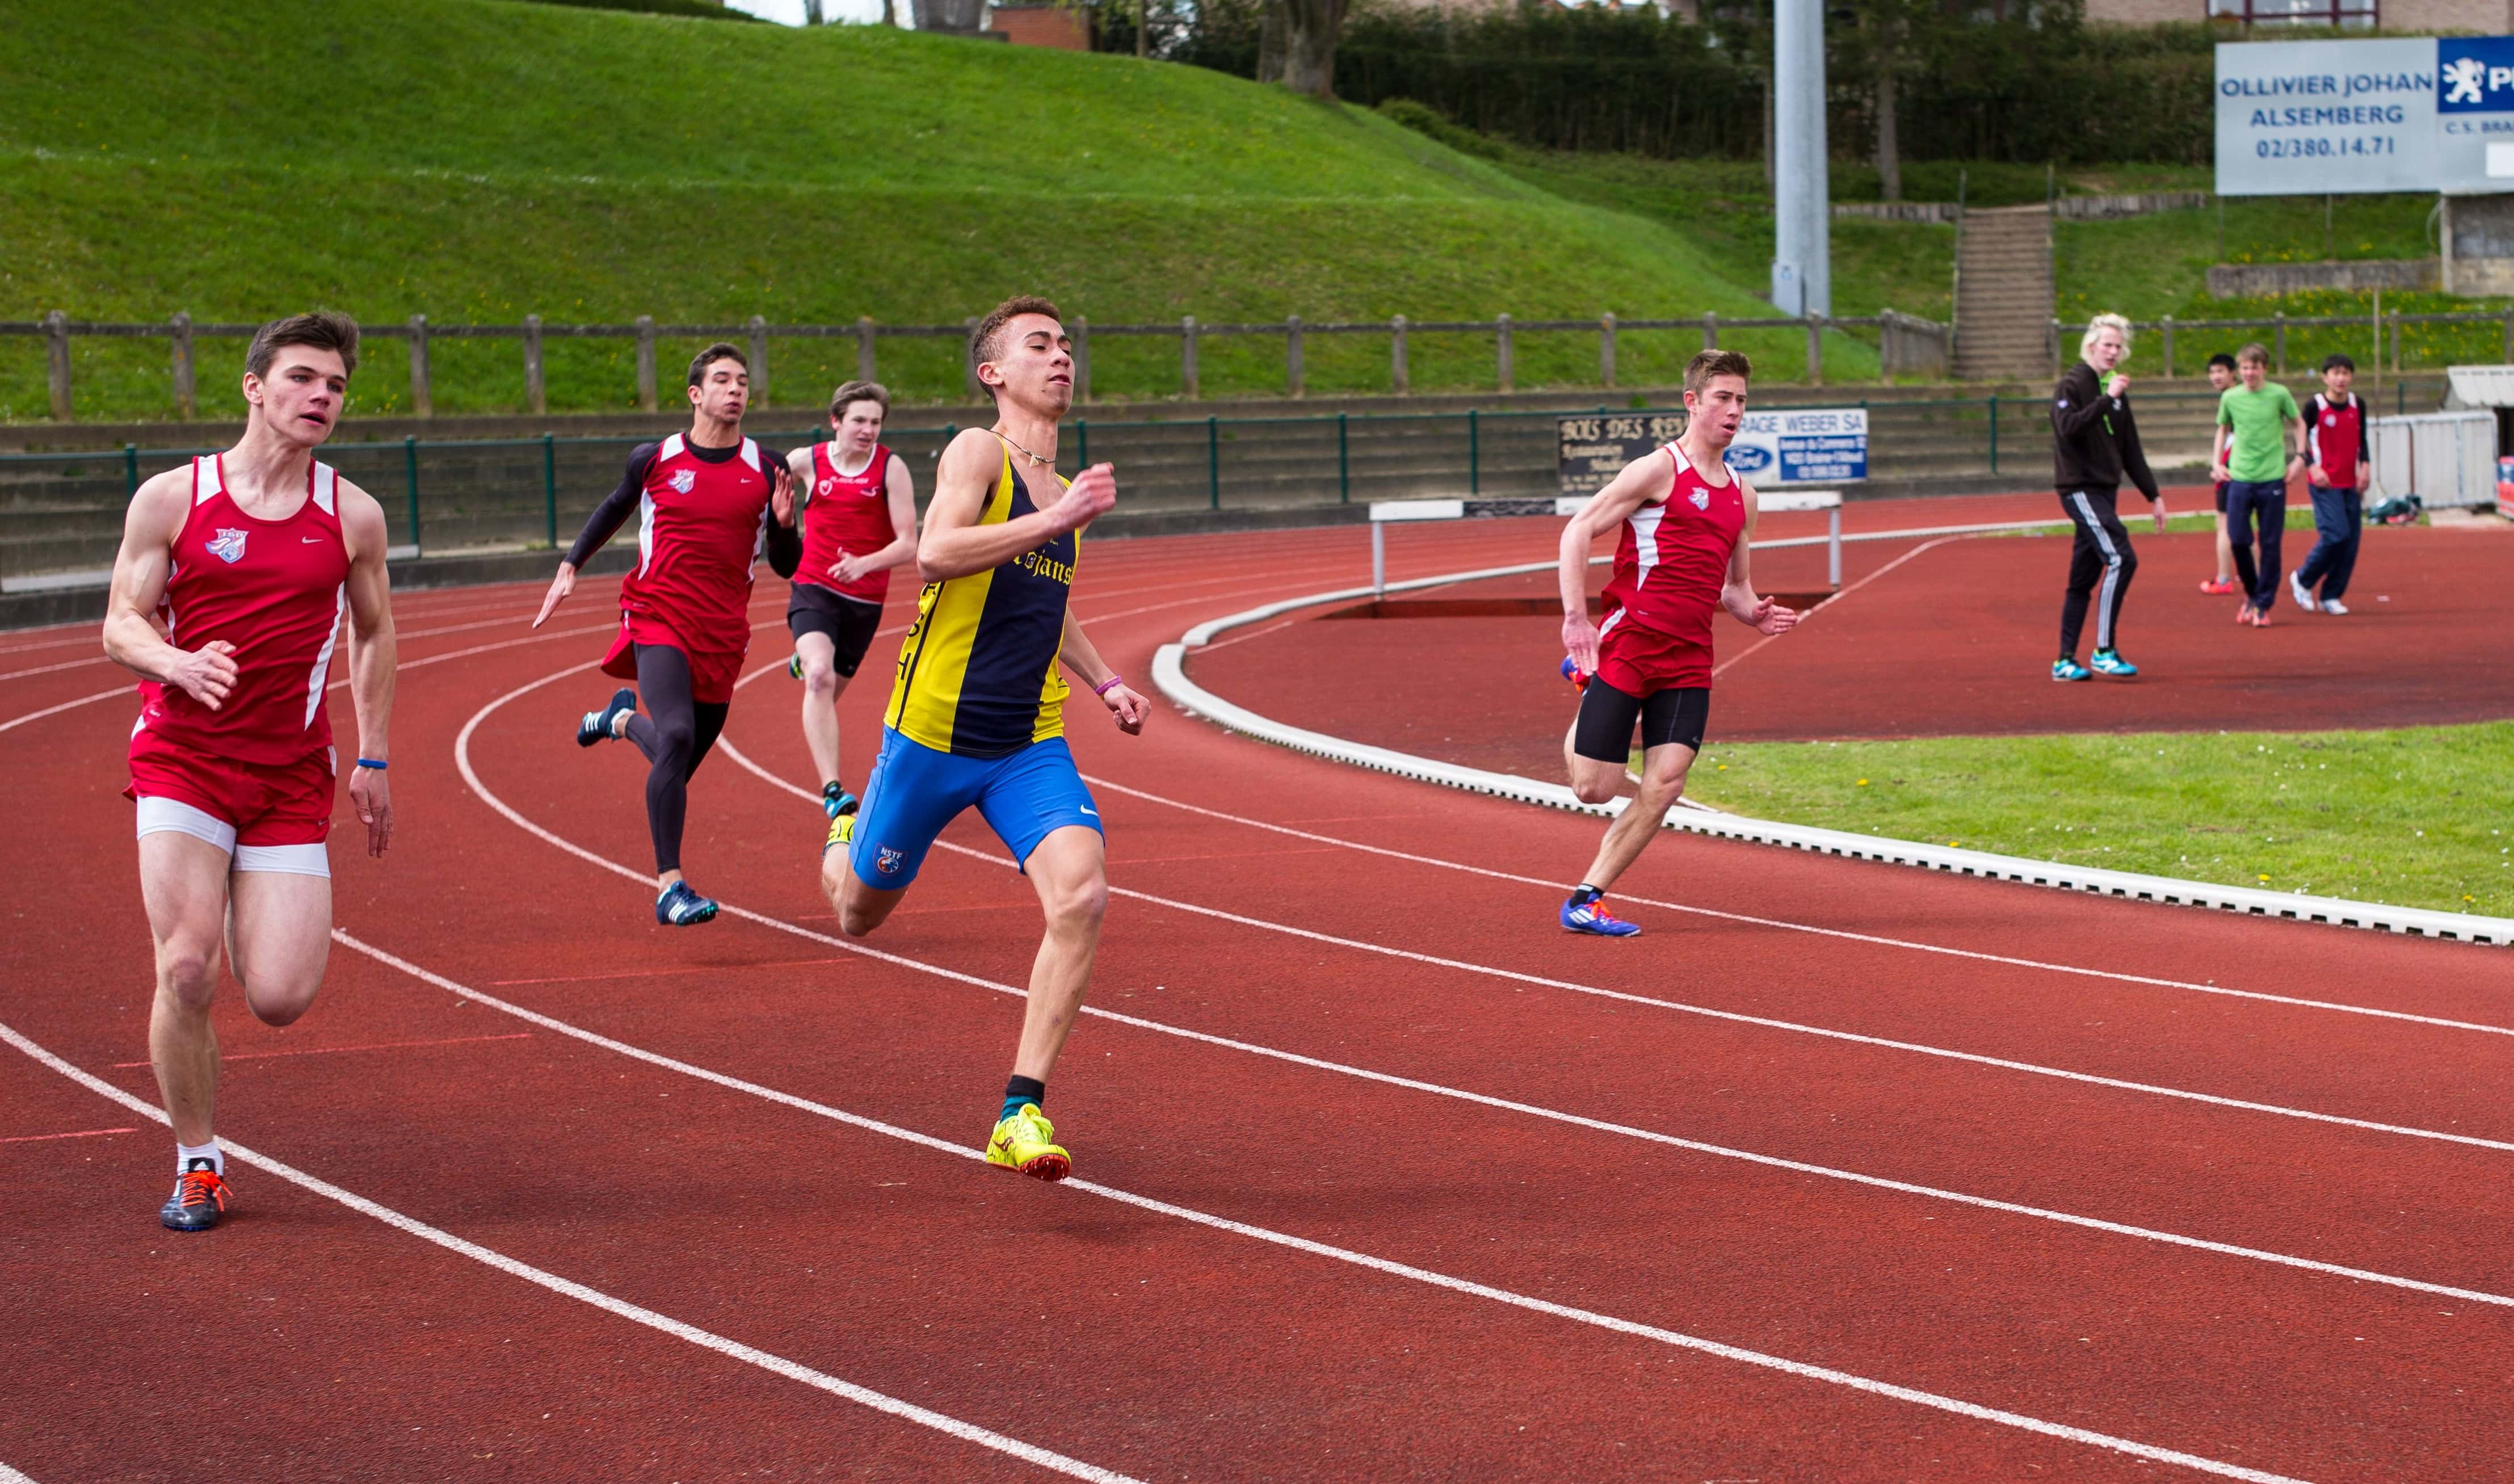 Free picture: race. sport. athlete. competition. stadium. foot race. marathon. exercise